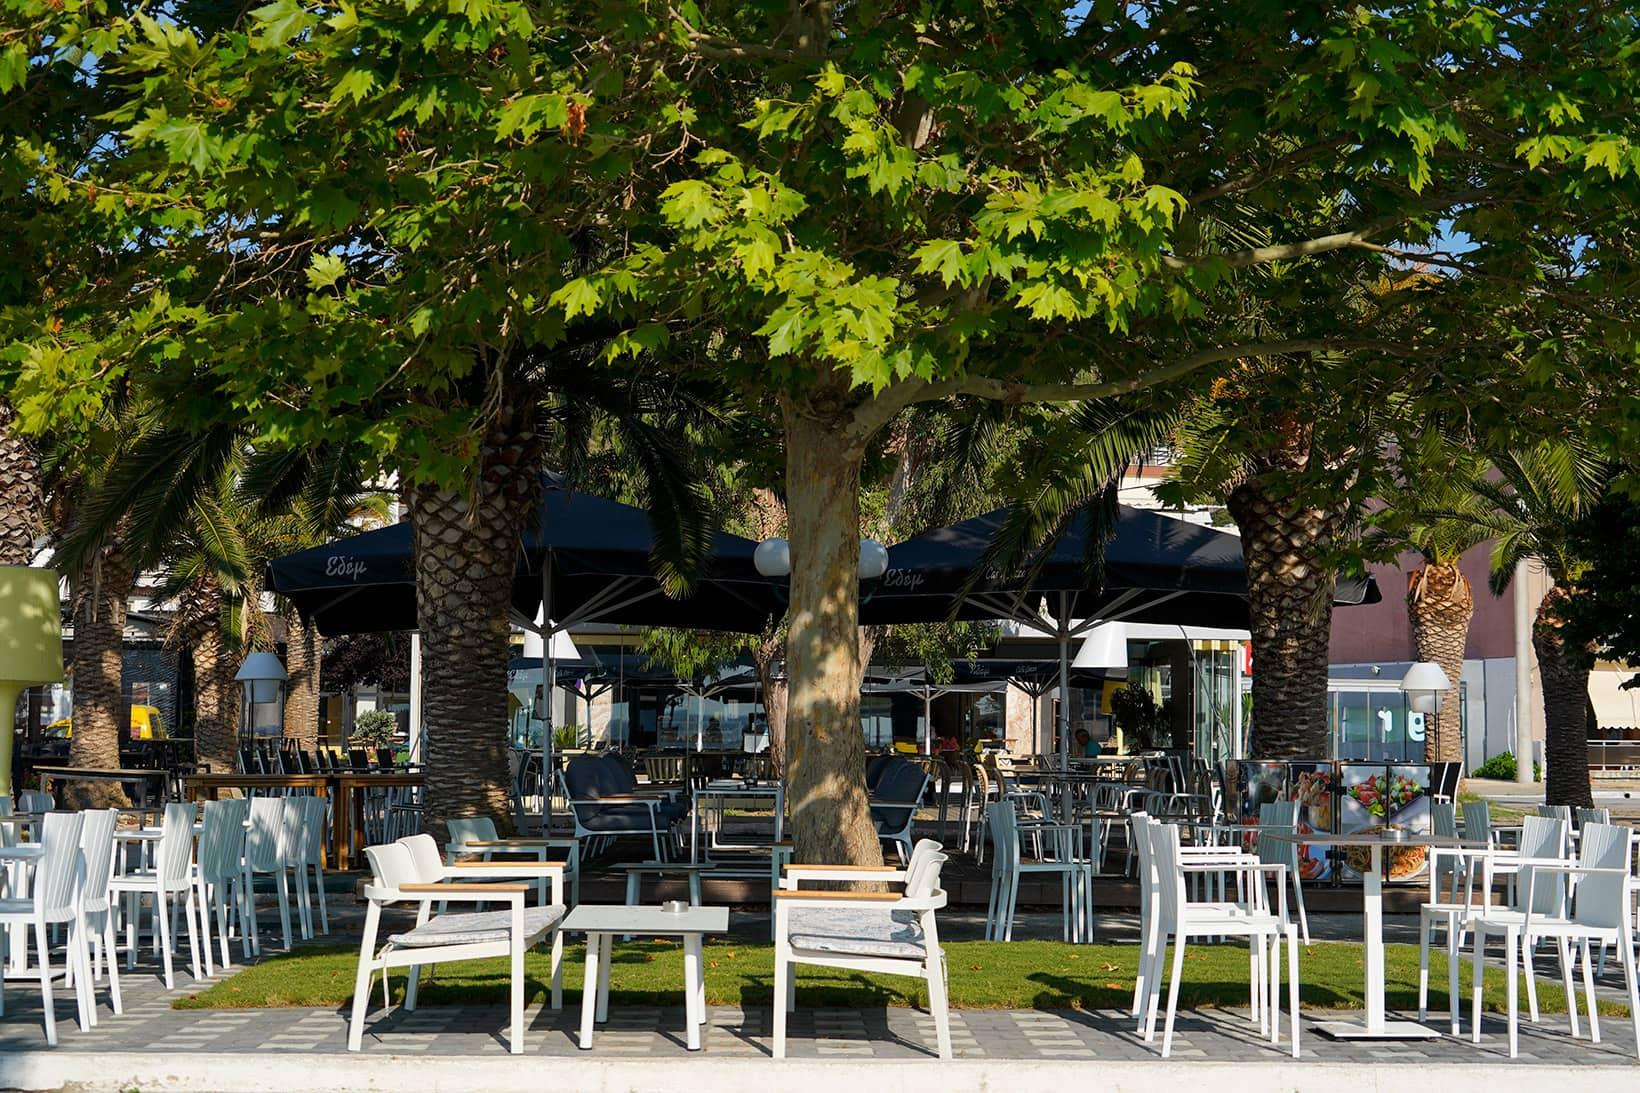 edem-cafe-peramos-apartments-beach-bar (5)